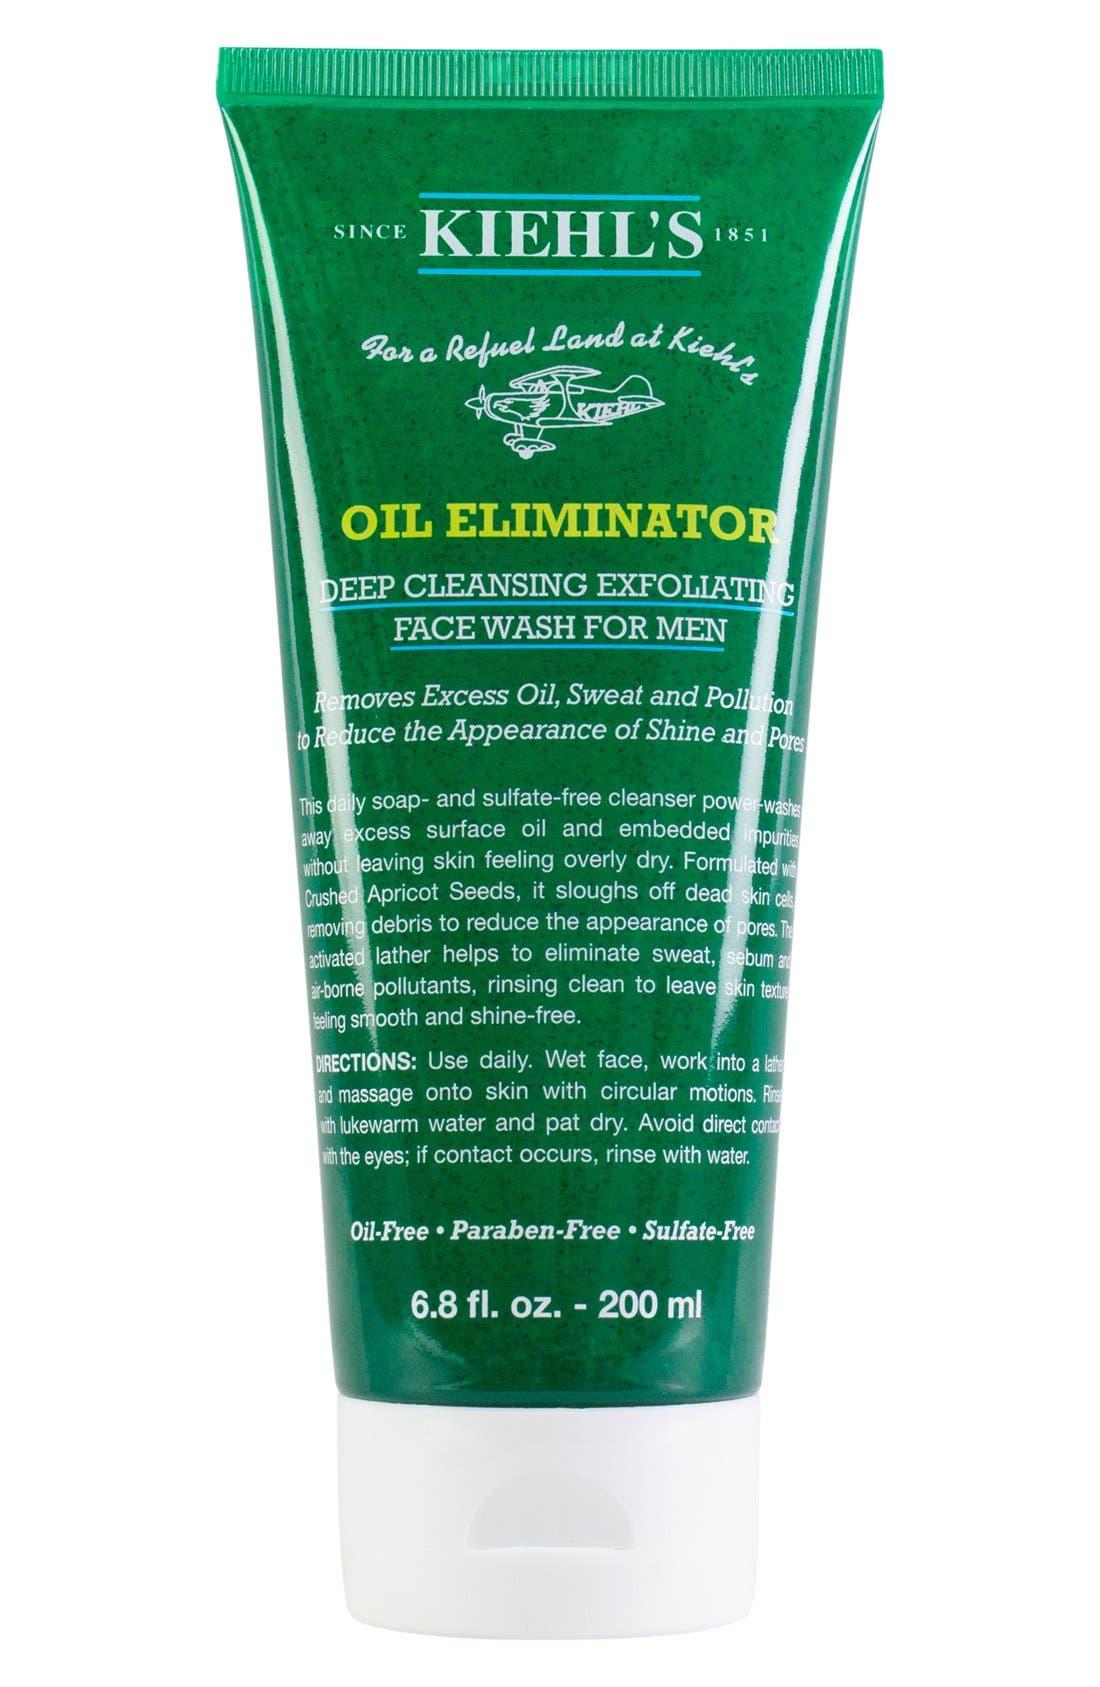 KIEHL'S SINCE 1851 'Oil Eliminator' Deep Cleansing Exfoliating Face Wash for Men, Main, color, NO COLOR